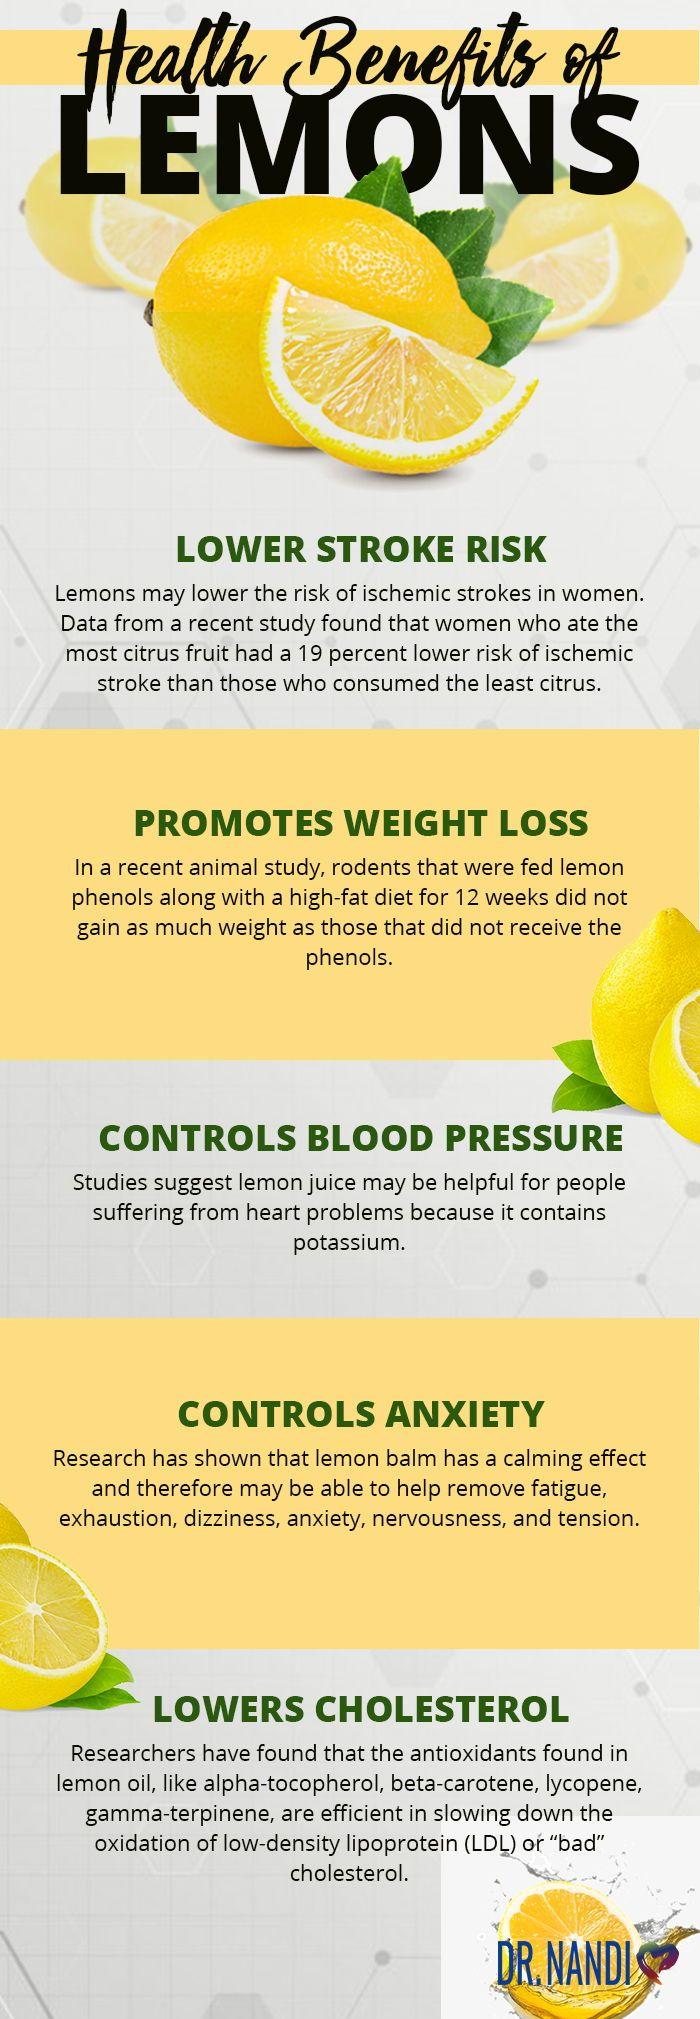 health-2-benefits-of